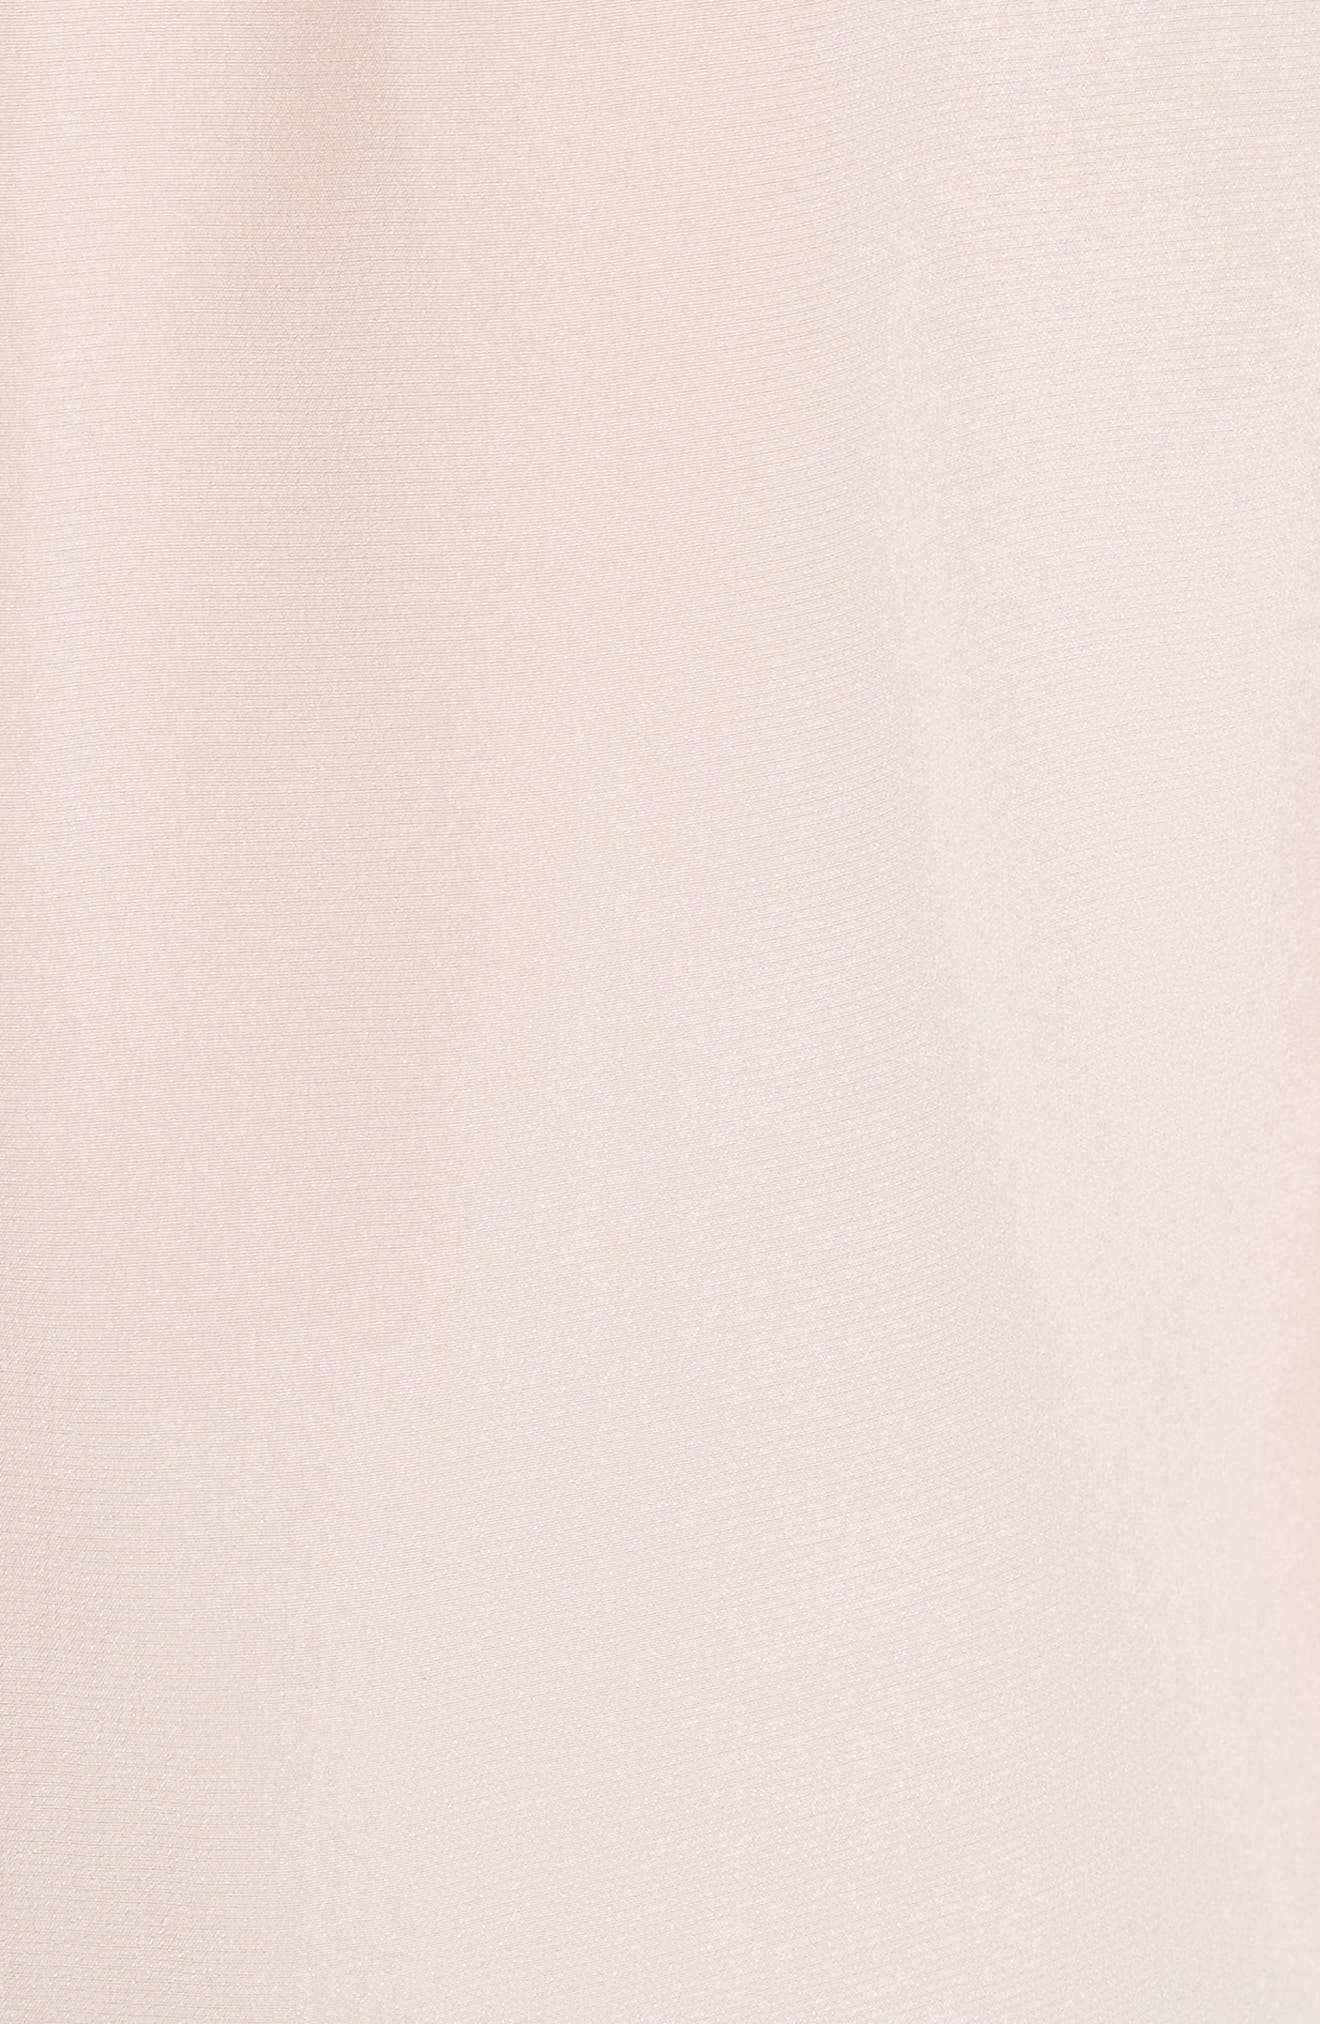 KATE SPADE NEW YORK,                             scallop trim silk shirt,                             Alternate thumbnail 5, color,                             663